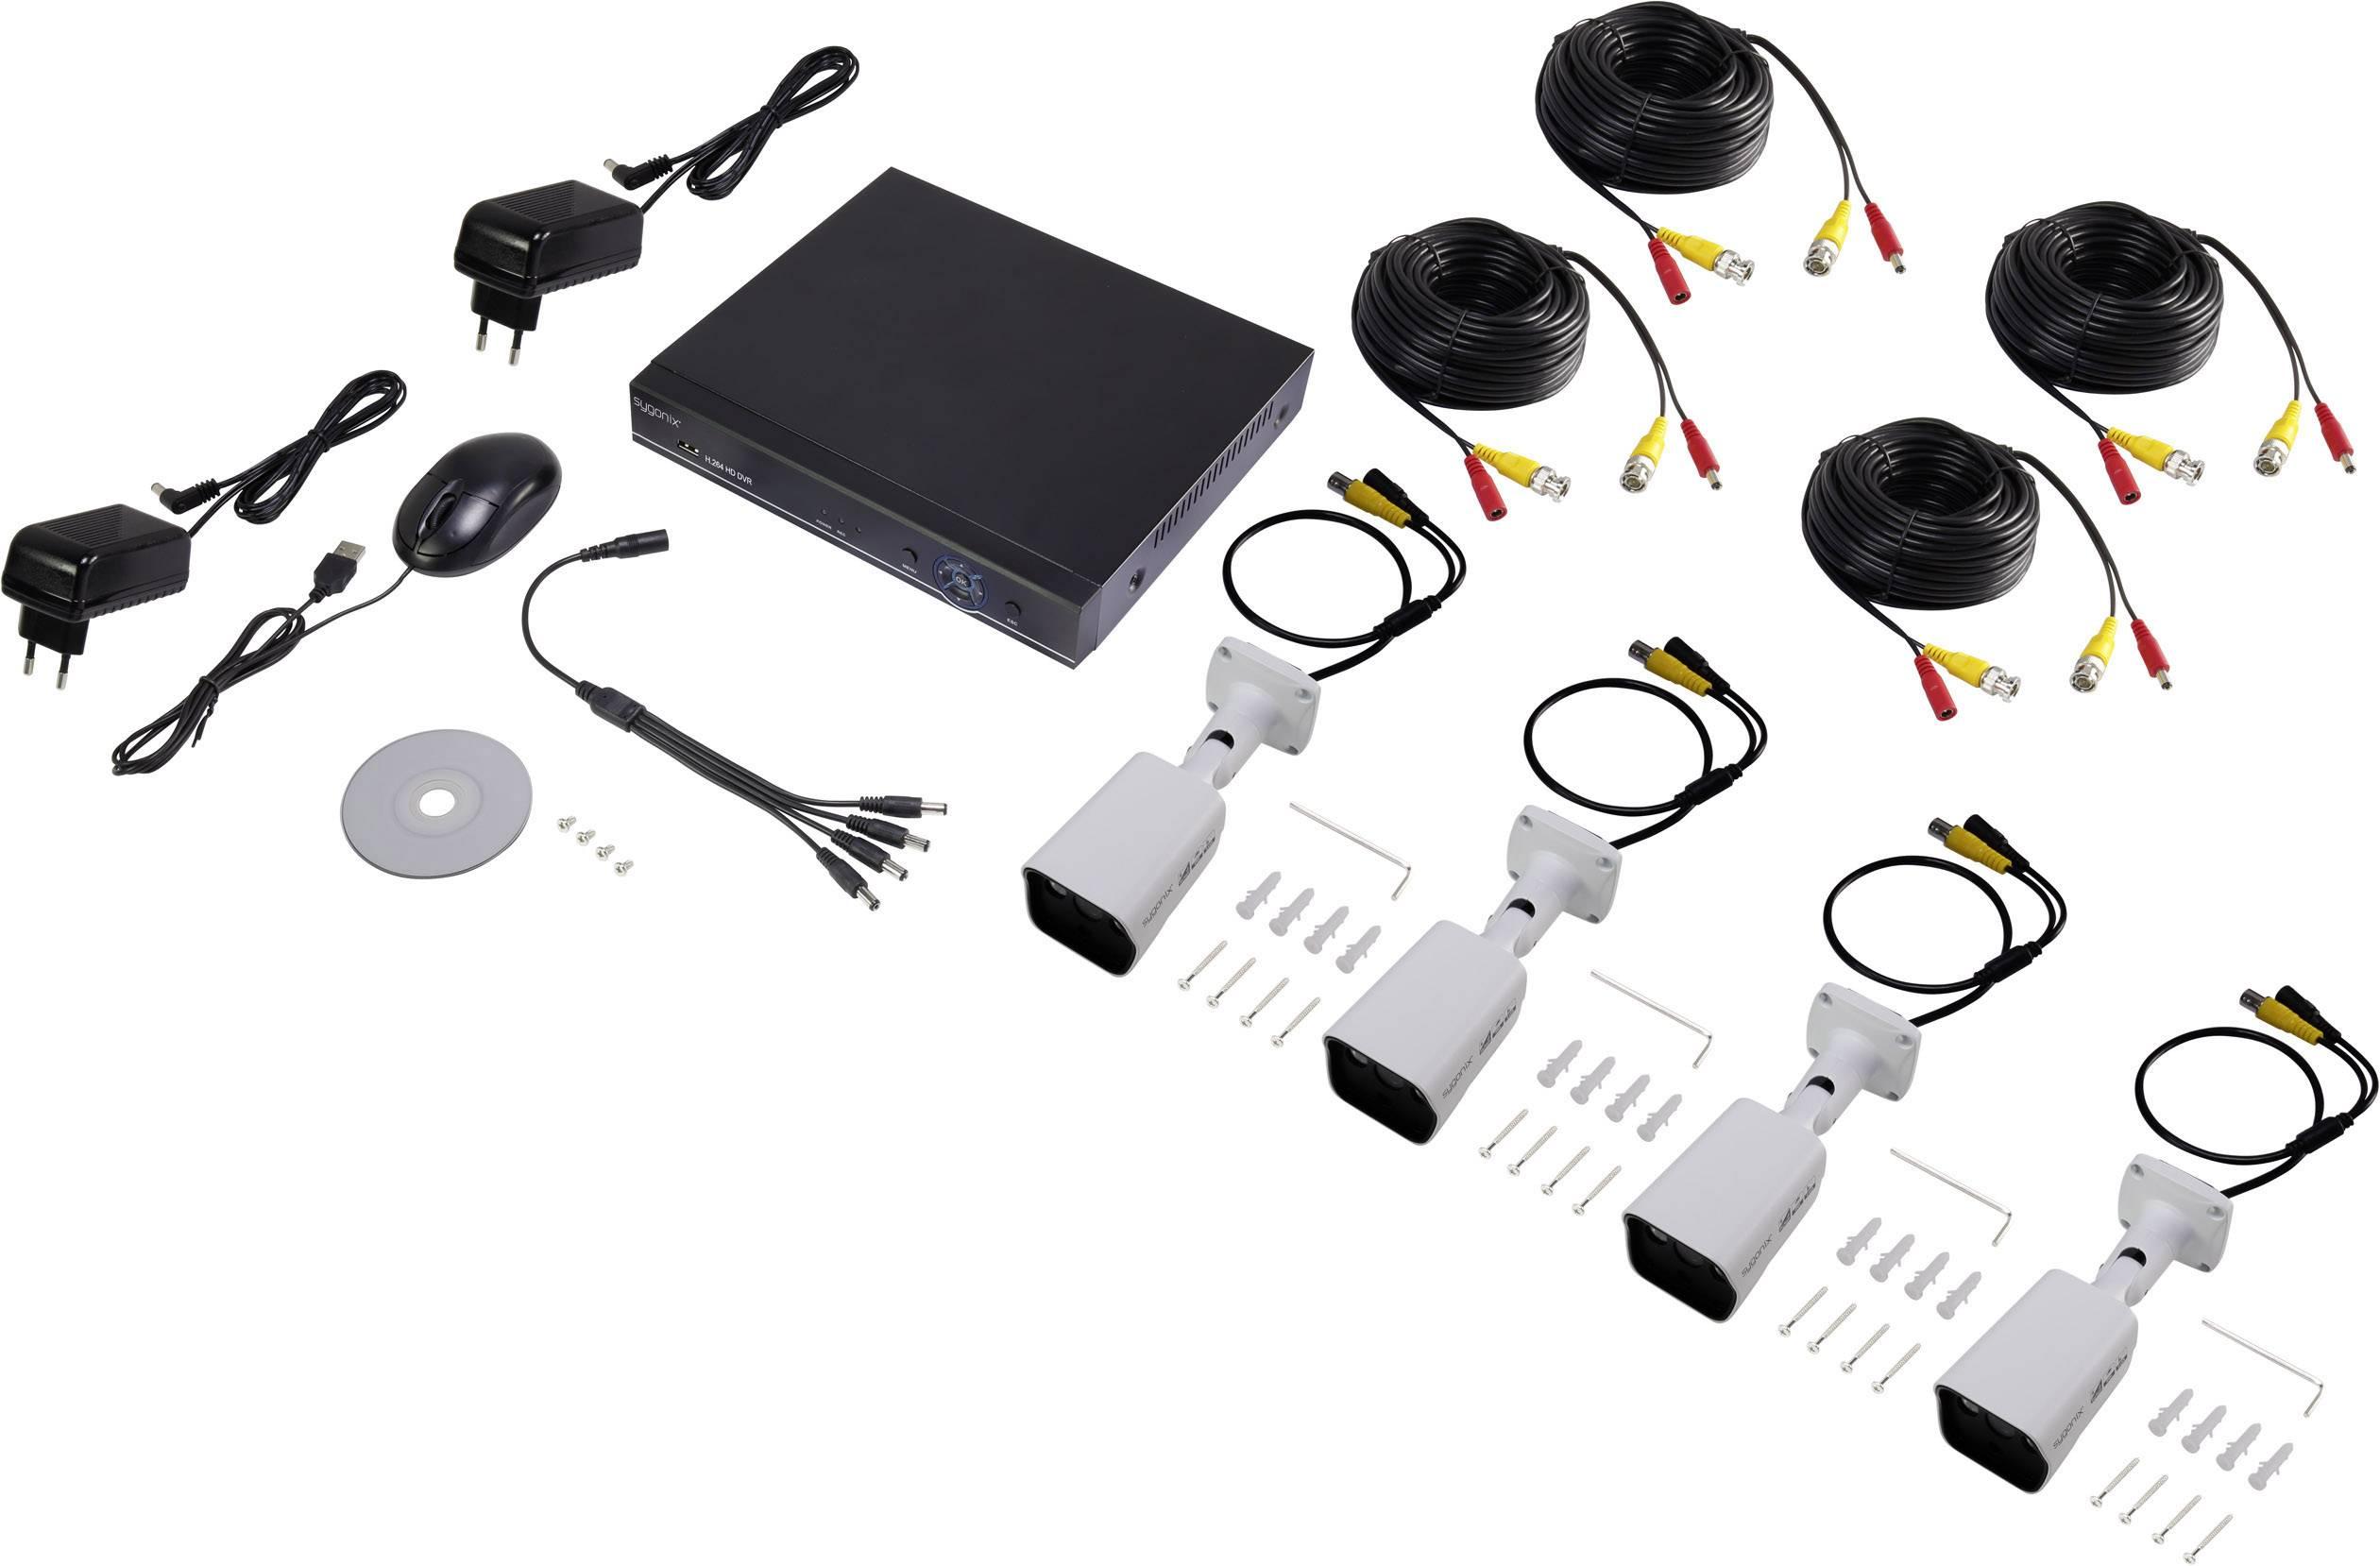 Kamerový systém Sygonix 10665Y1, kompletná súprava